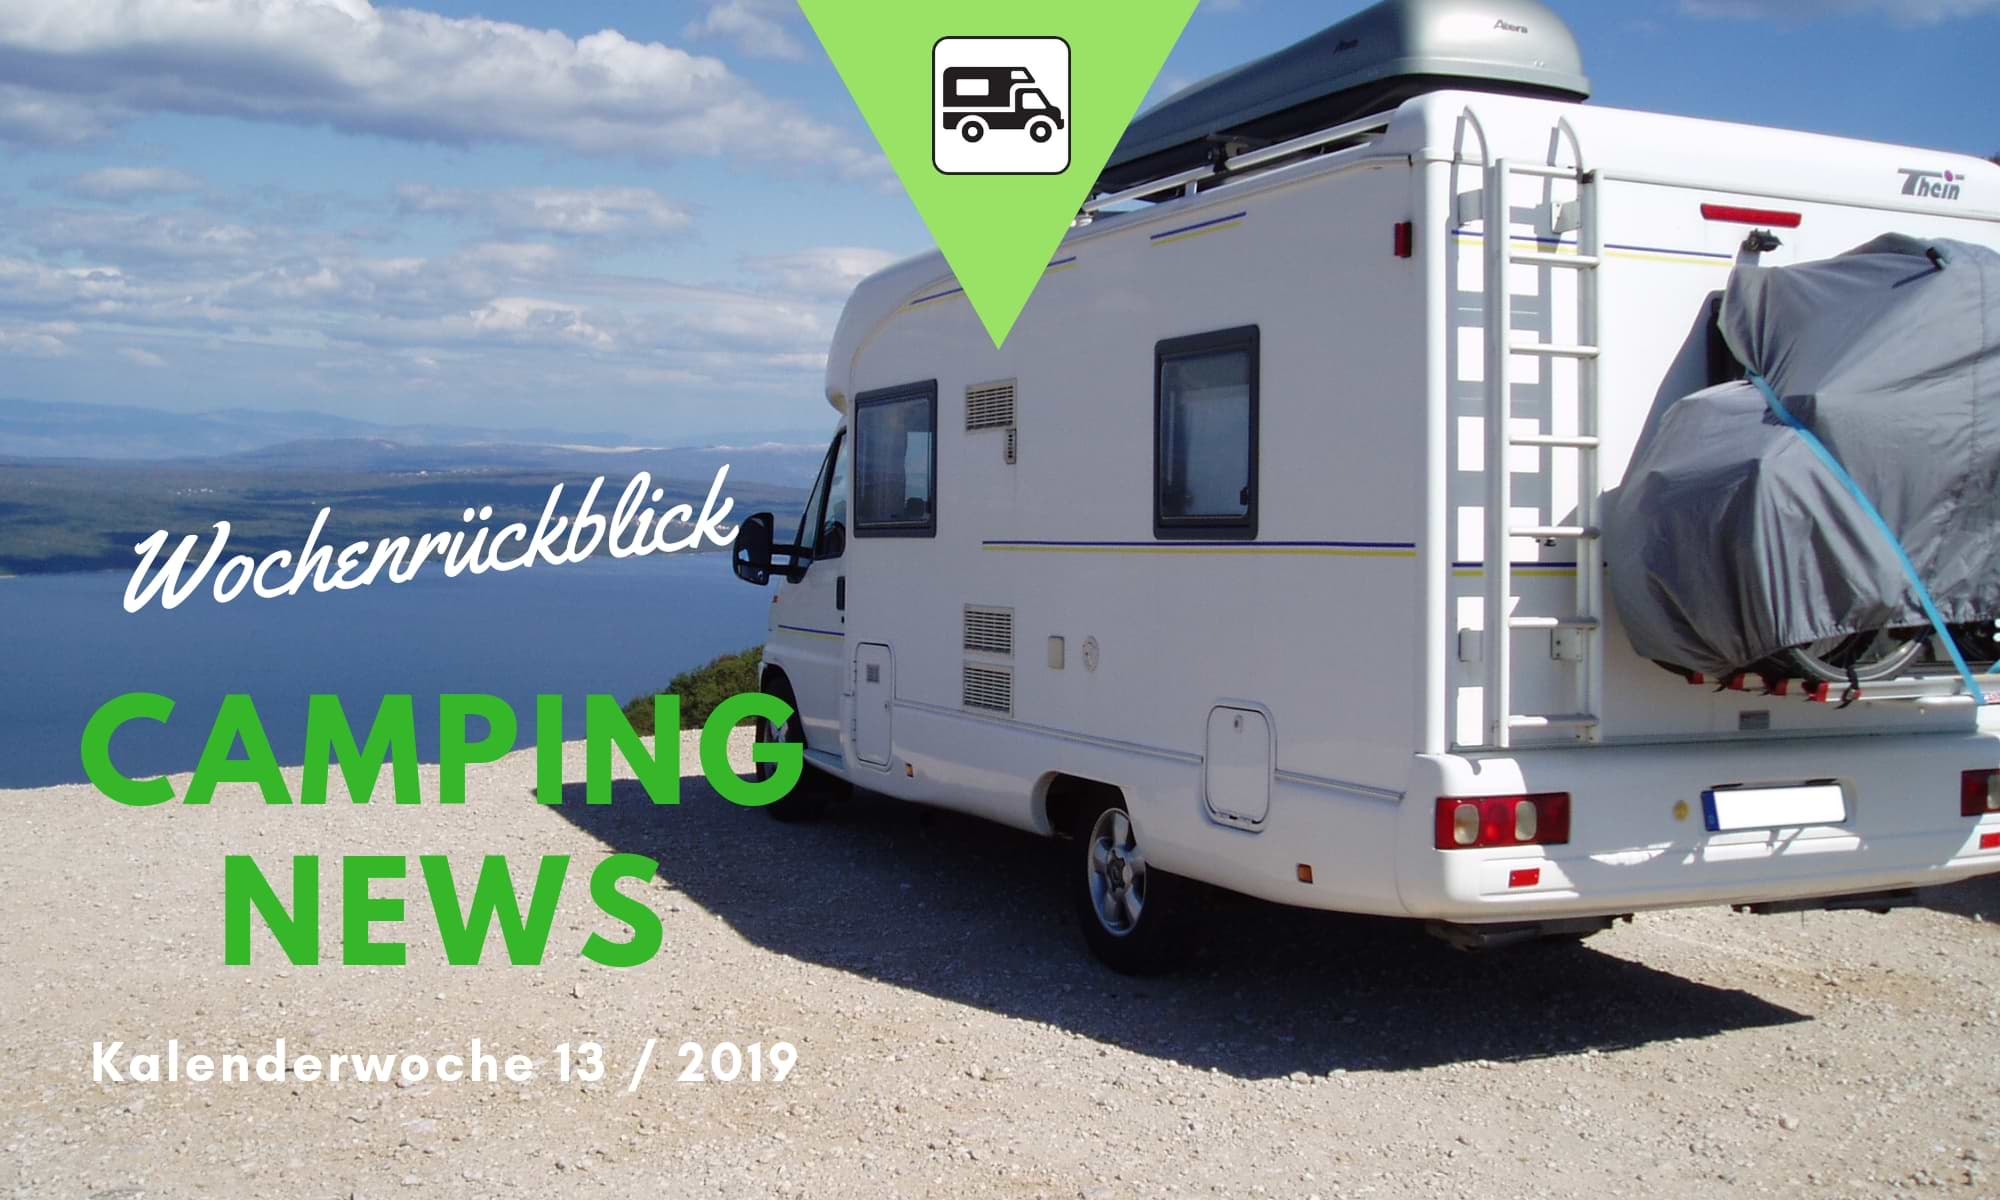 Wochenrückblick Camping News KW13-2019